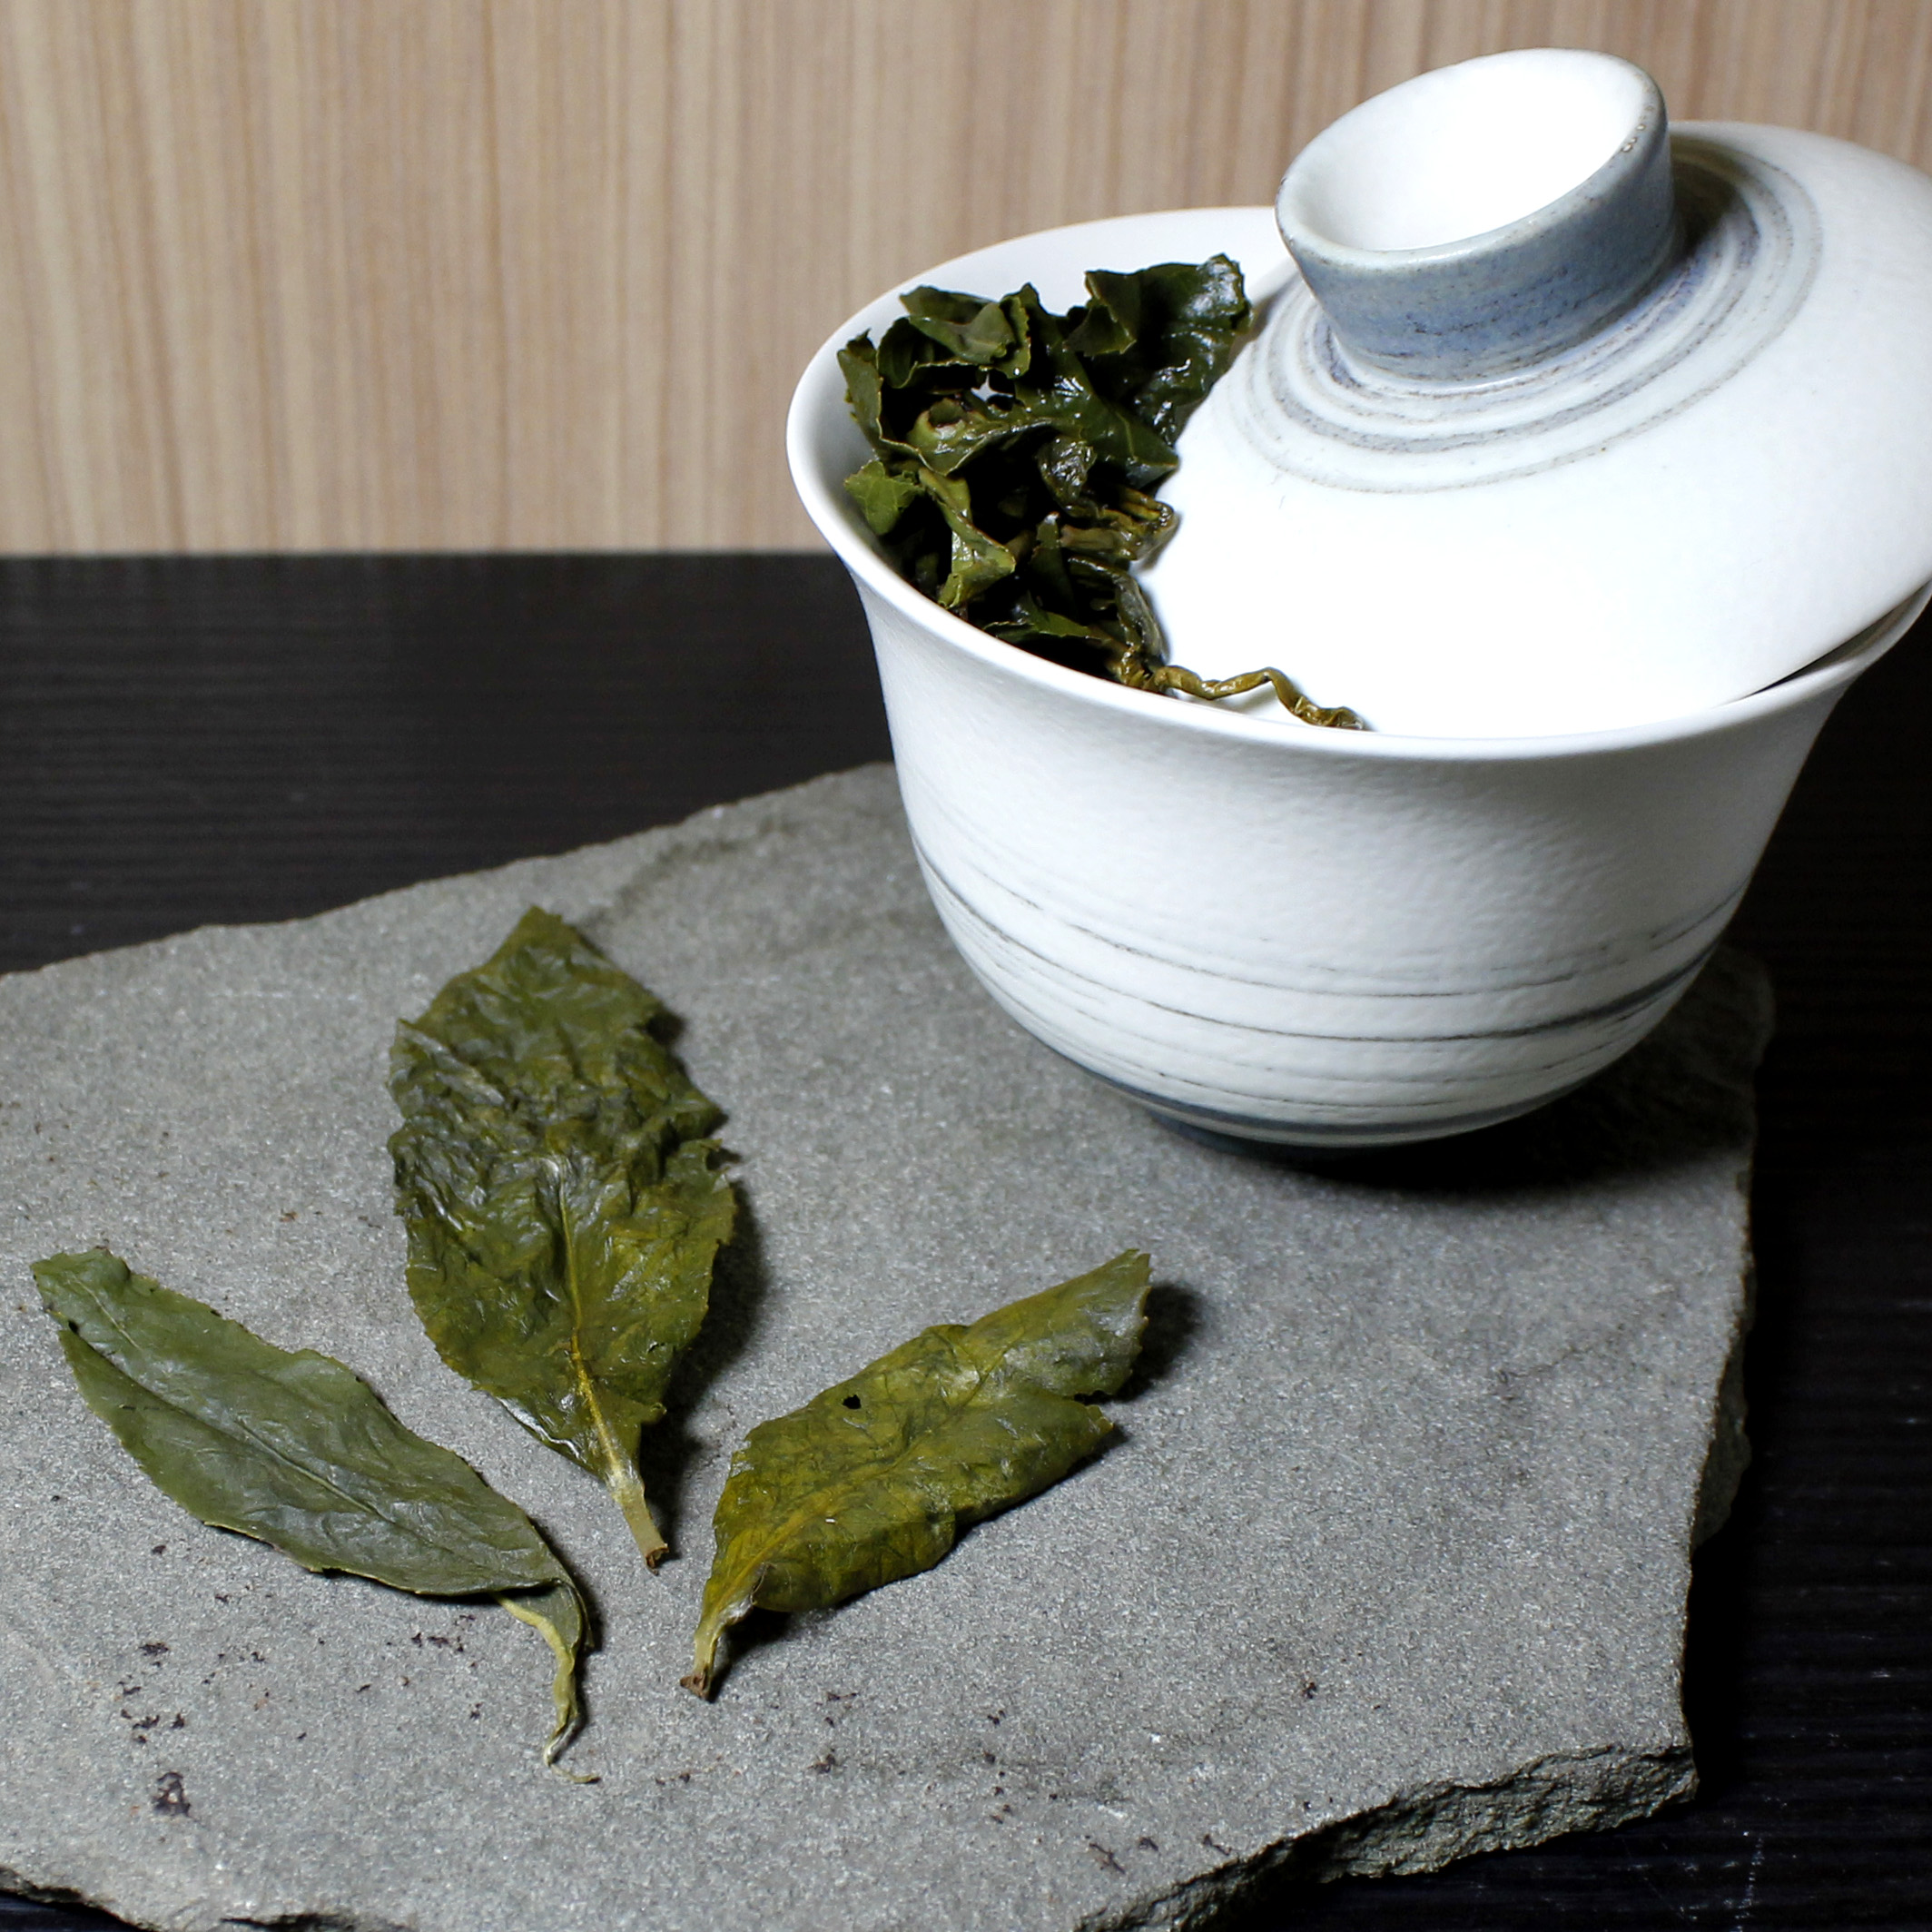 shan-lin-xi-oolong-whole-leaf-loose-tea-itw4-2019a.jpg